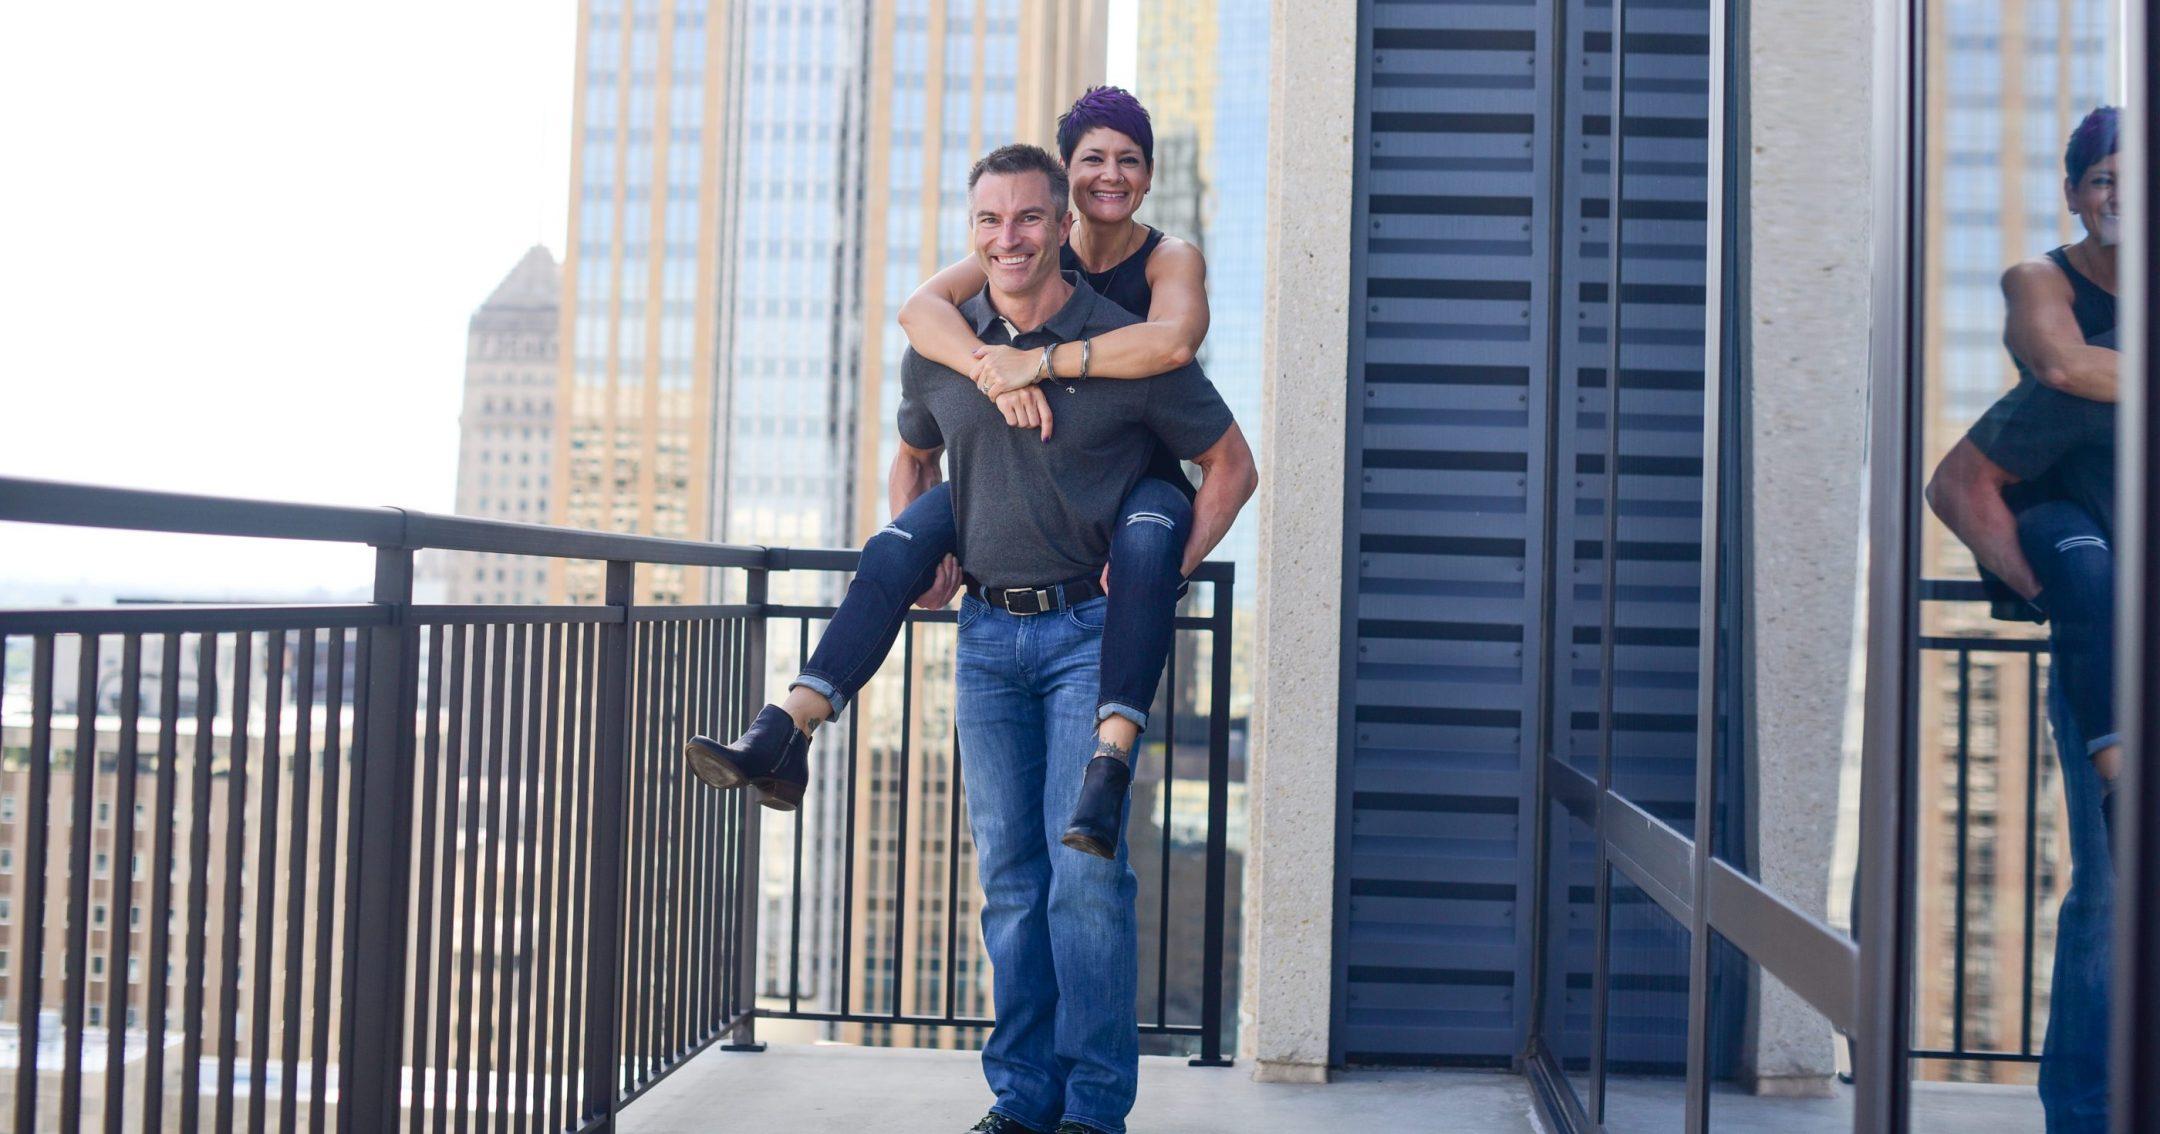 About Tom Nikkola Vanessa Romero Healthy Living How To